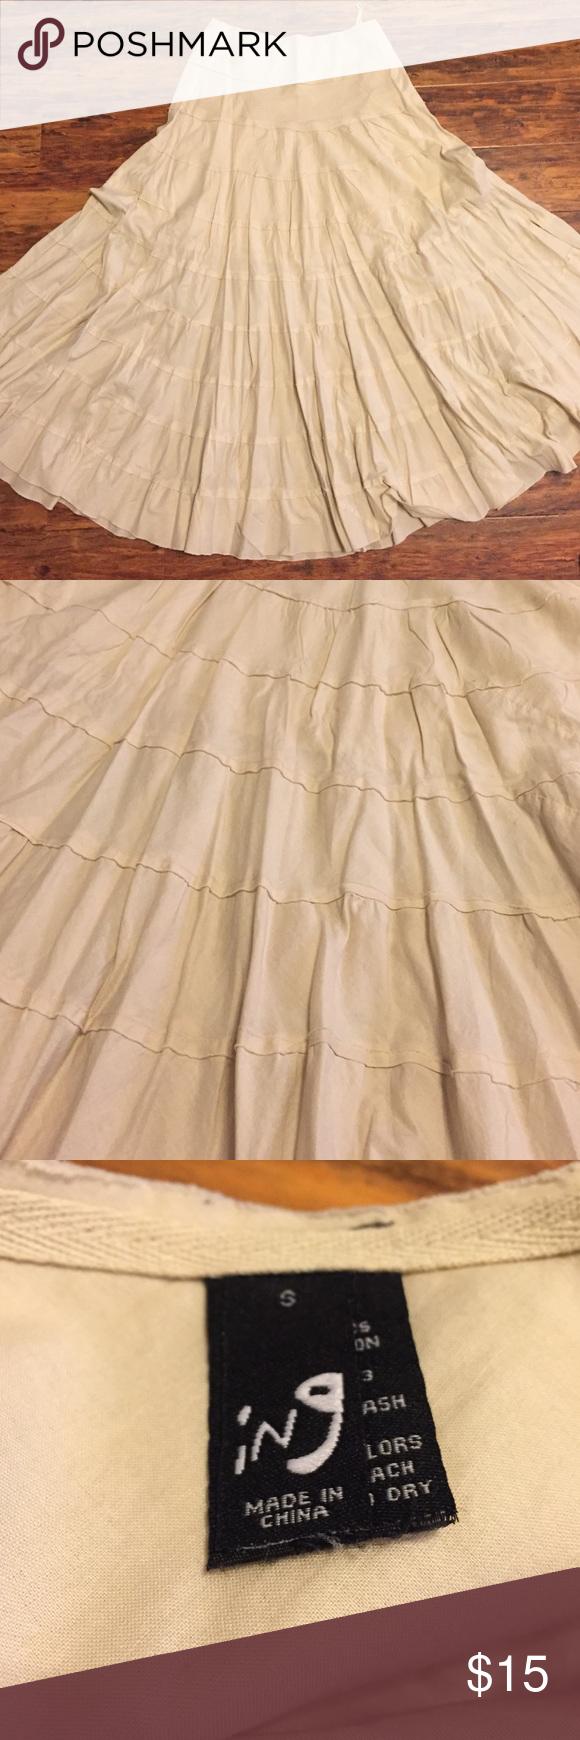 Ing Ruffled Maxi Skirt | Maxis, Faldas maxi y Crema